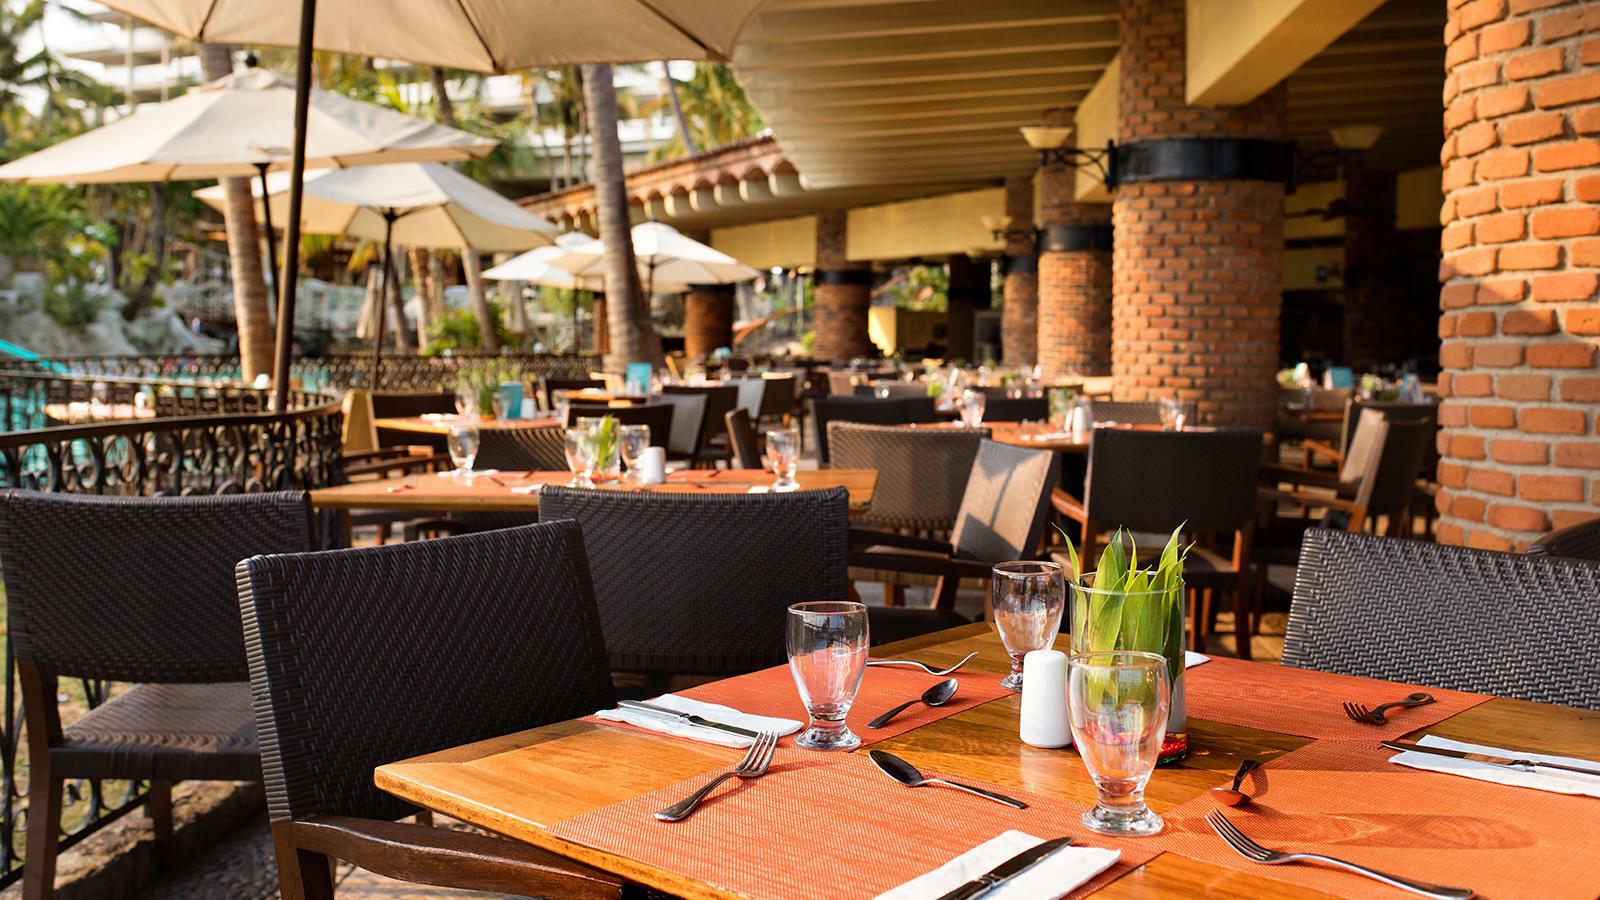 Dining area at Chula Vista Restaurant in Mundo Imperial